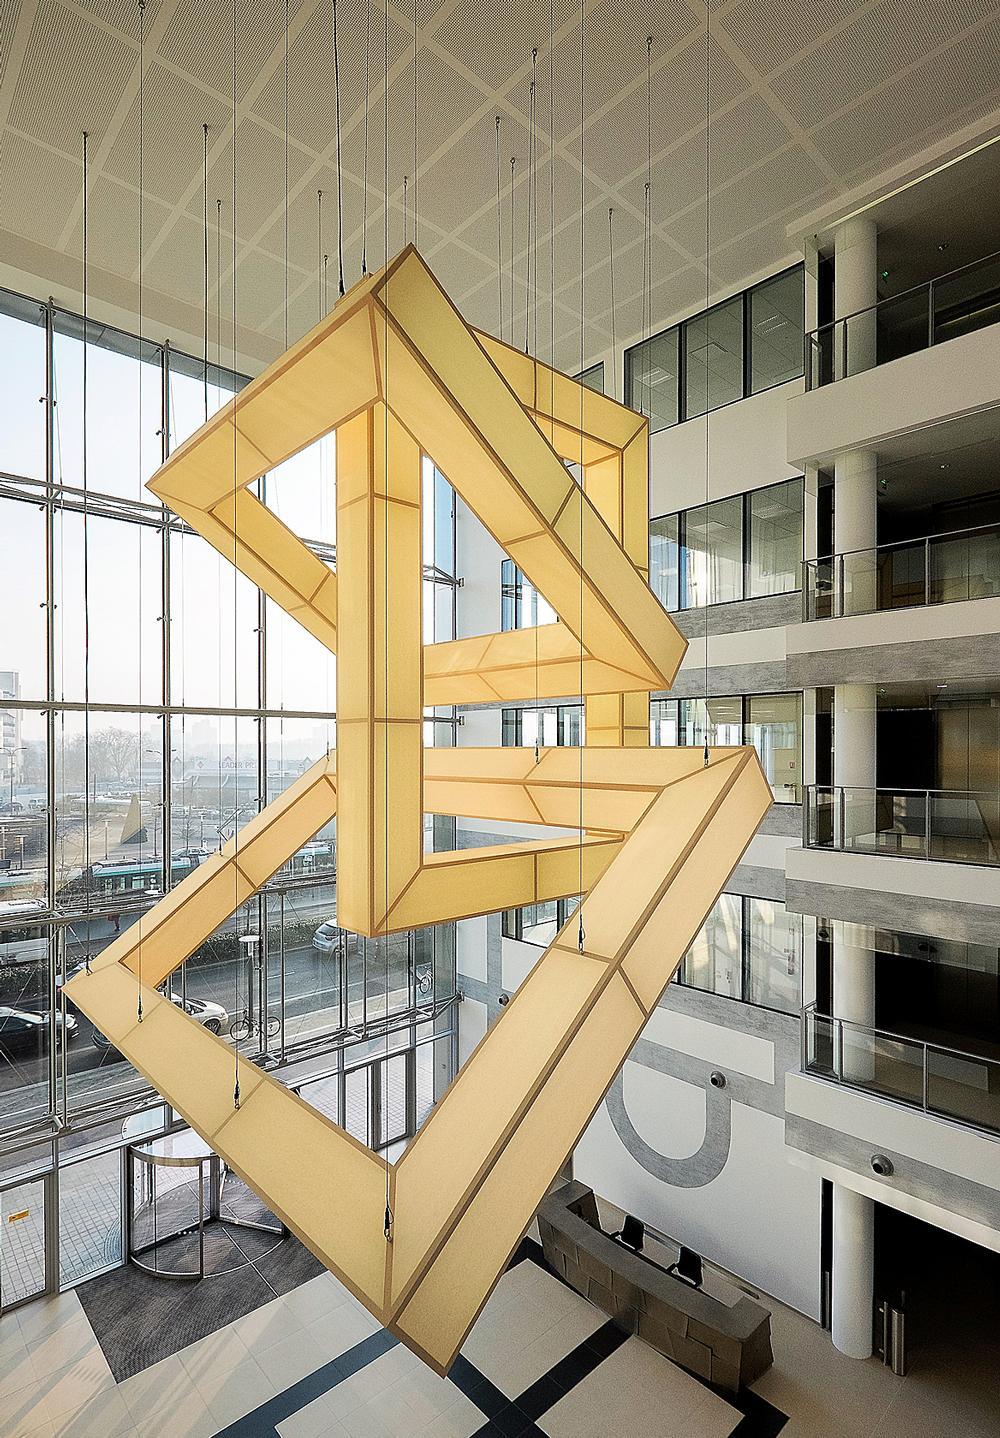 SCENEO's officebuildingin Bezons, France, was awardedWELLcertification